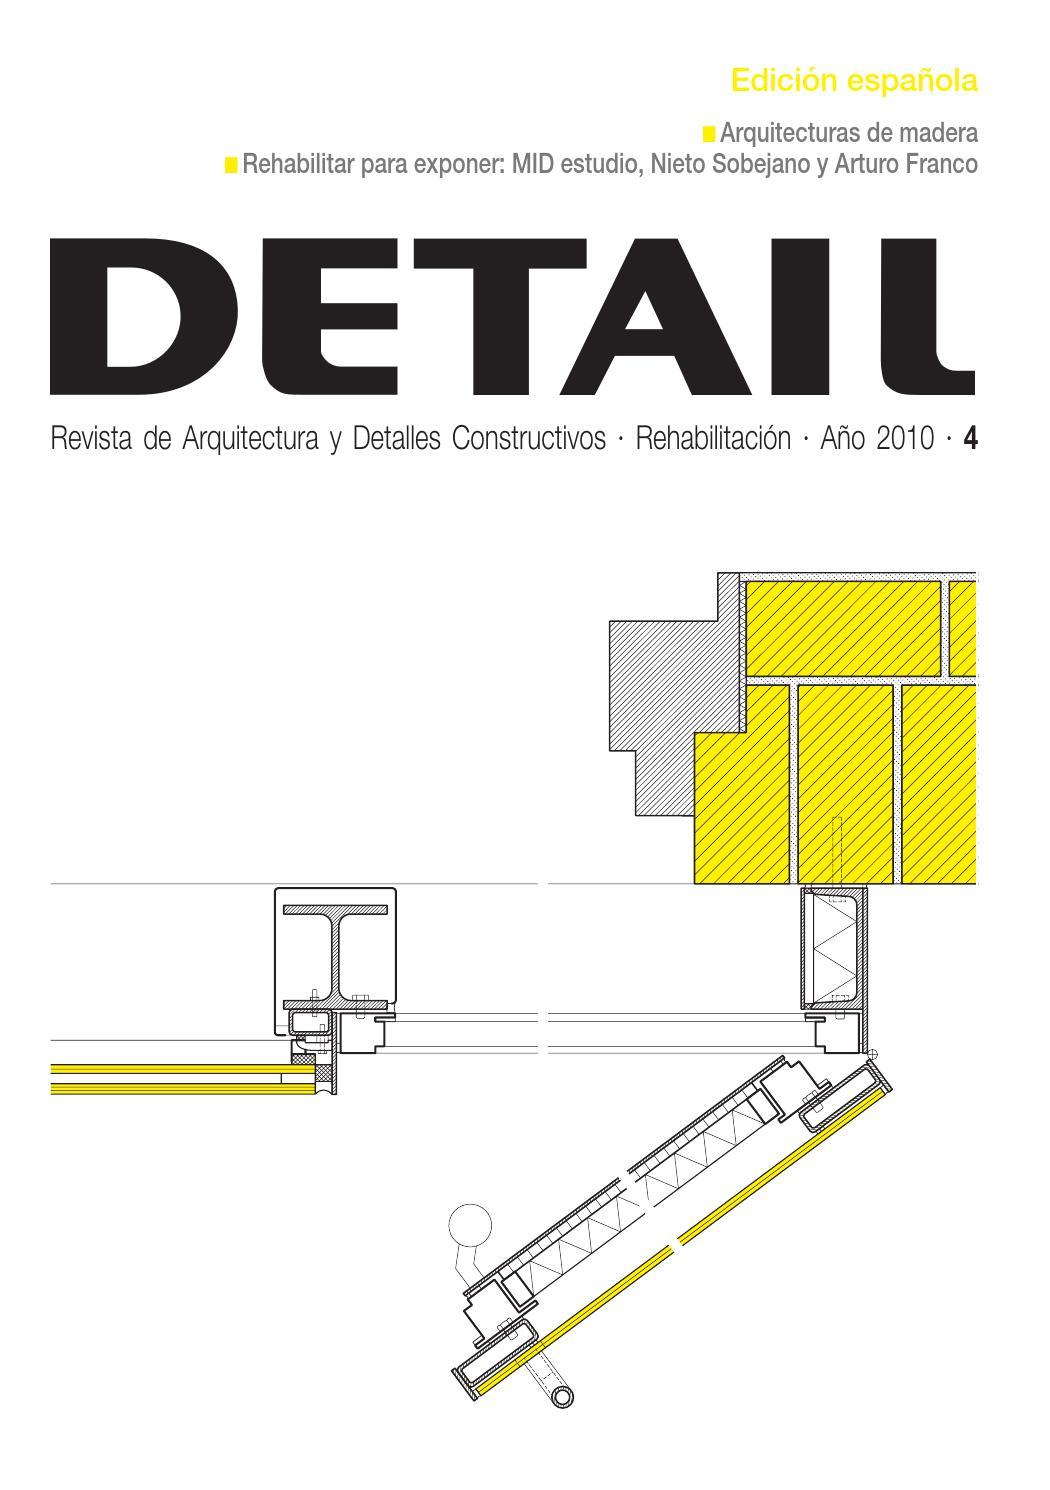 DETAIL Rehabilitación 2010 by Arte Cemento - issuu